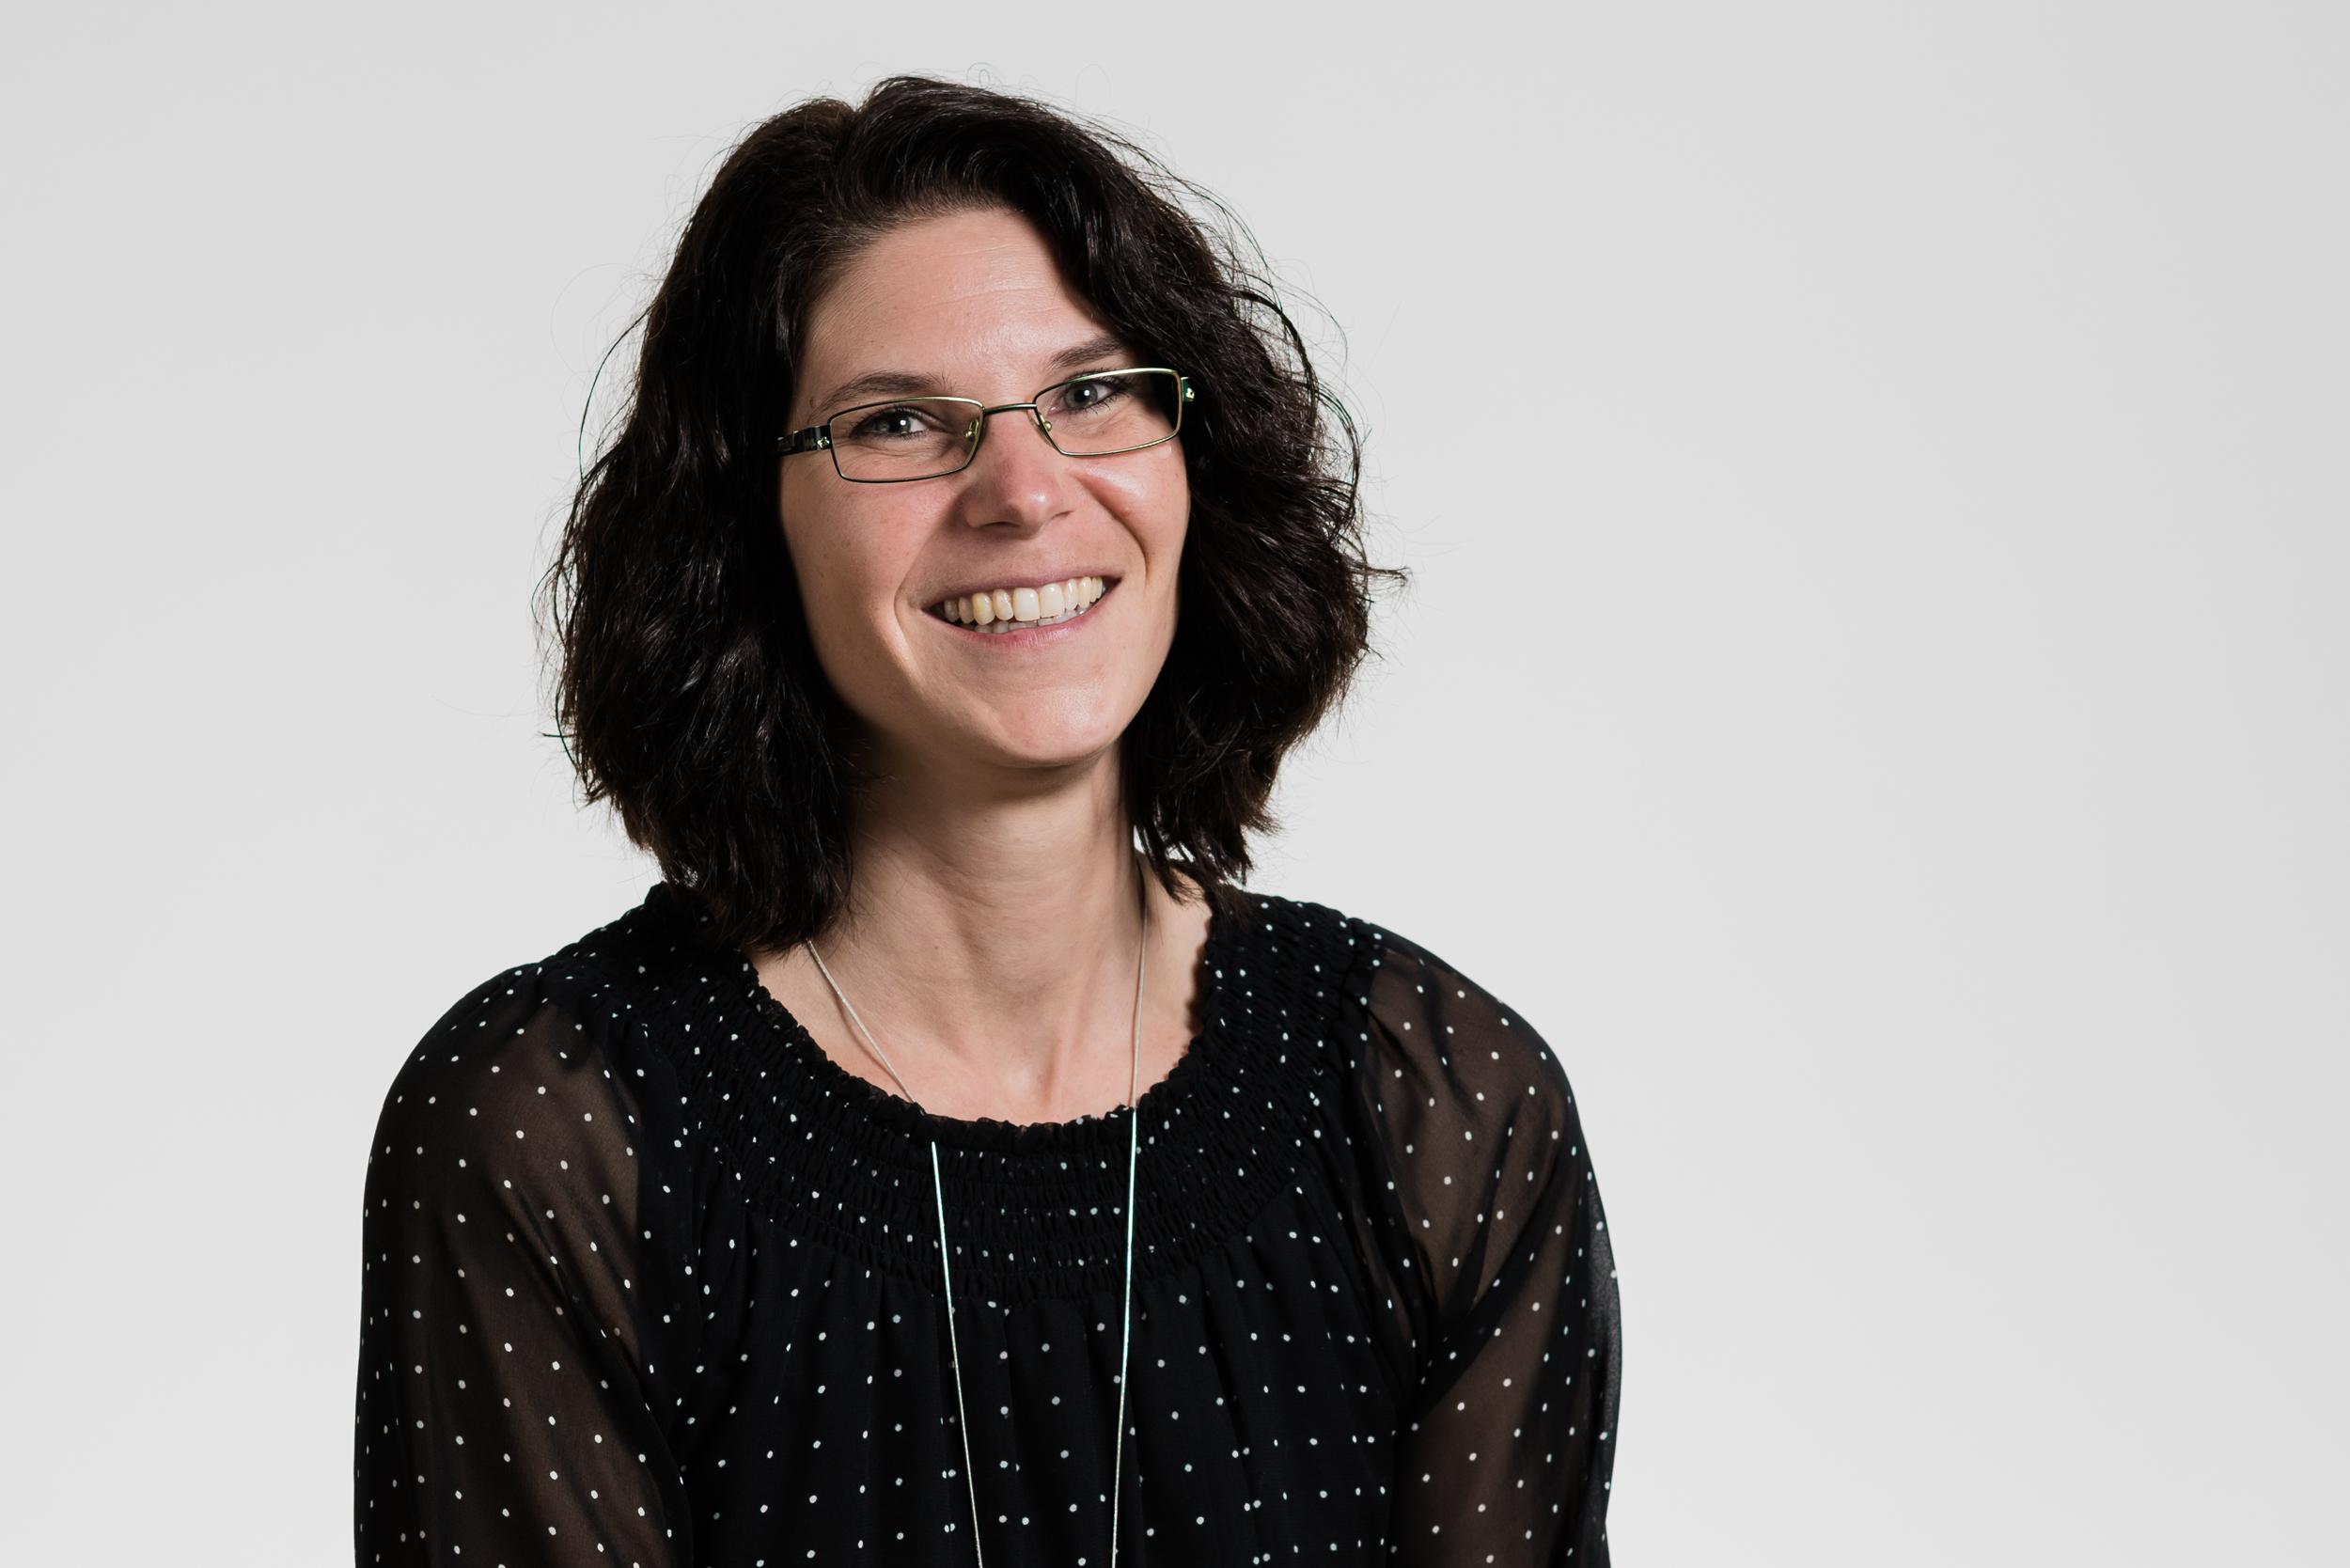 Karin Leuenberger, Sekretärin / Buchhalterin